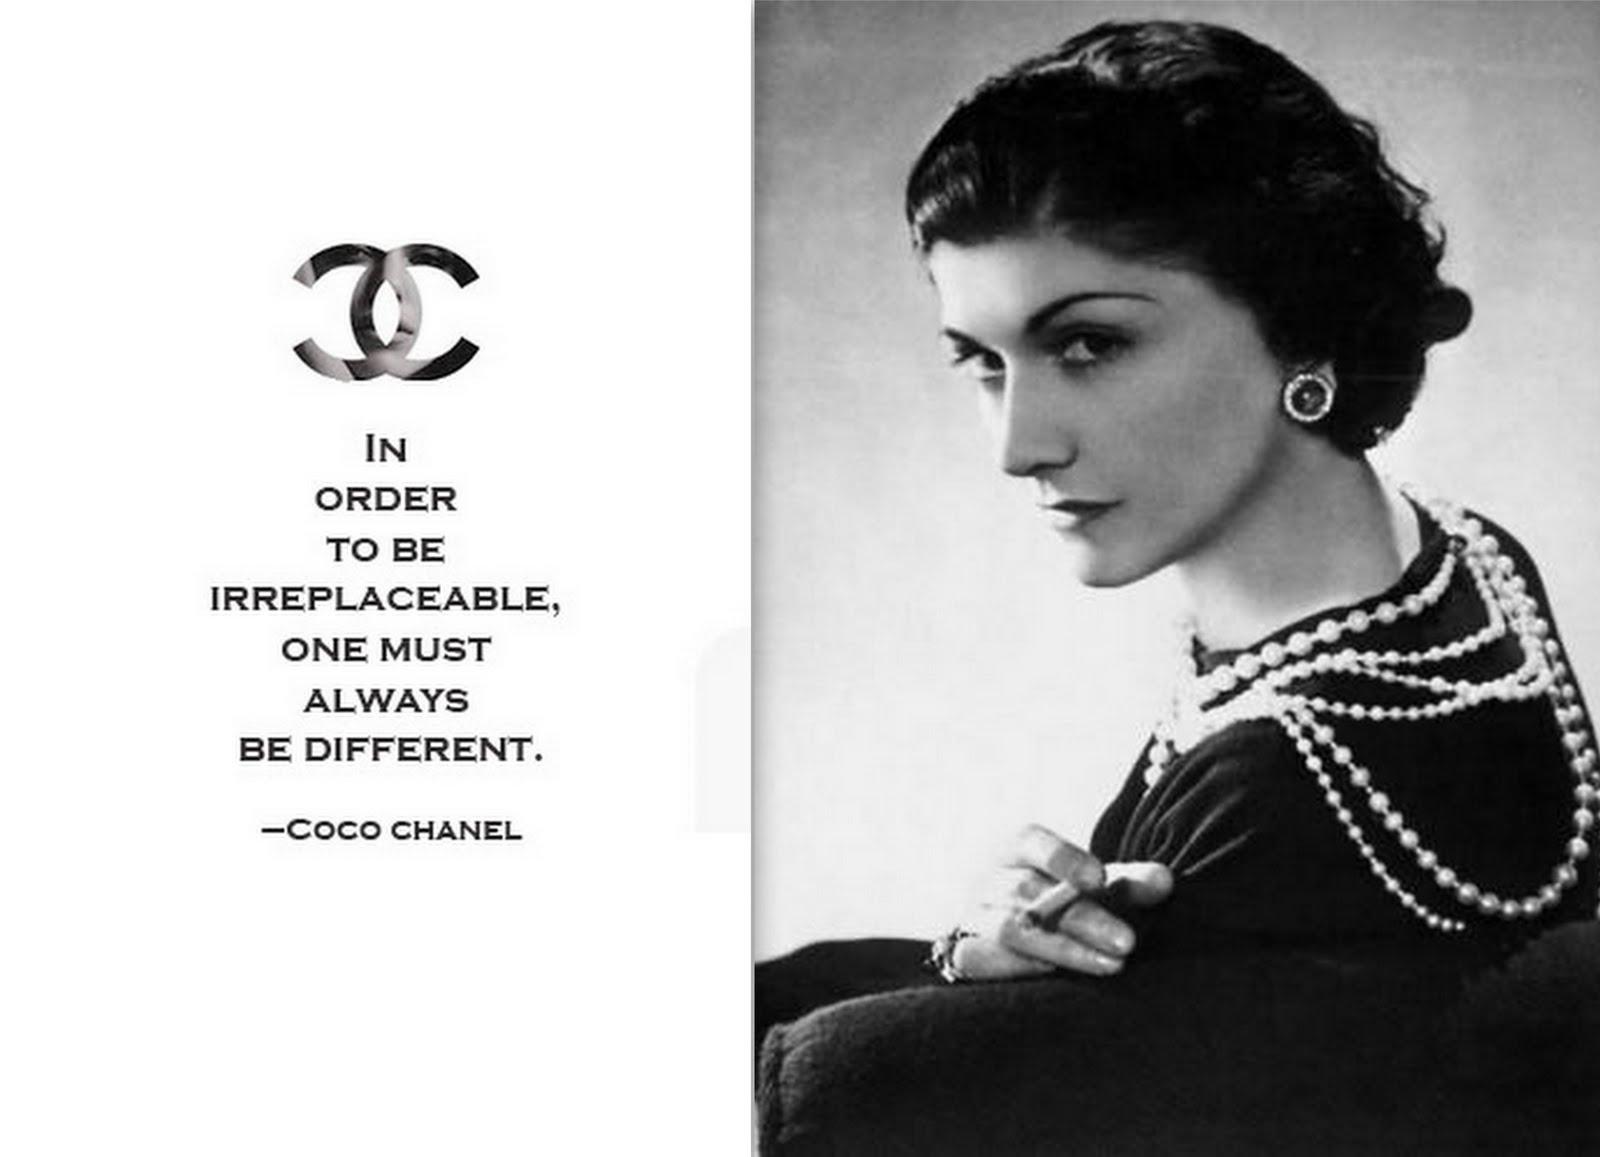 Coco Chanel Corseted Silhouette Liberator Global Granary